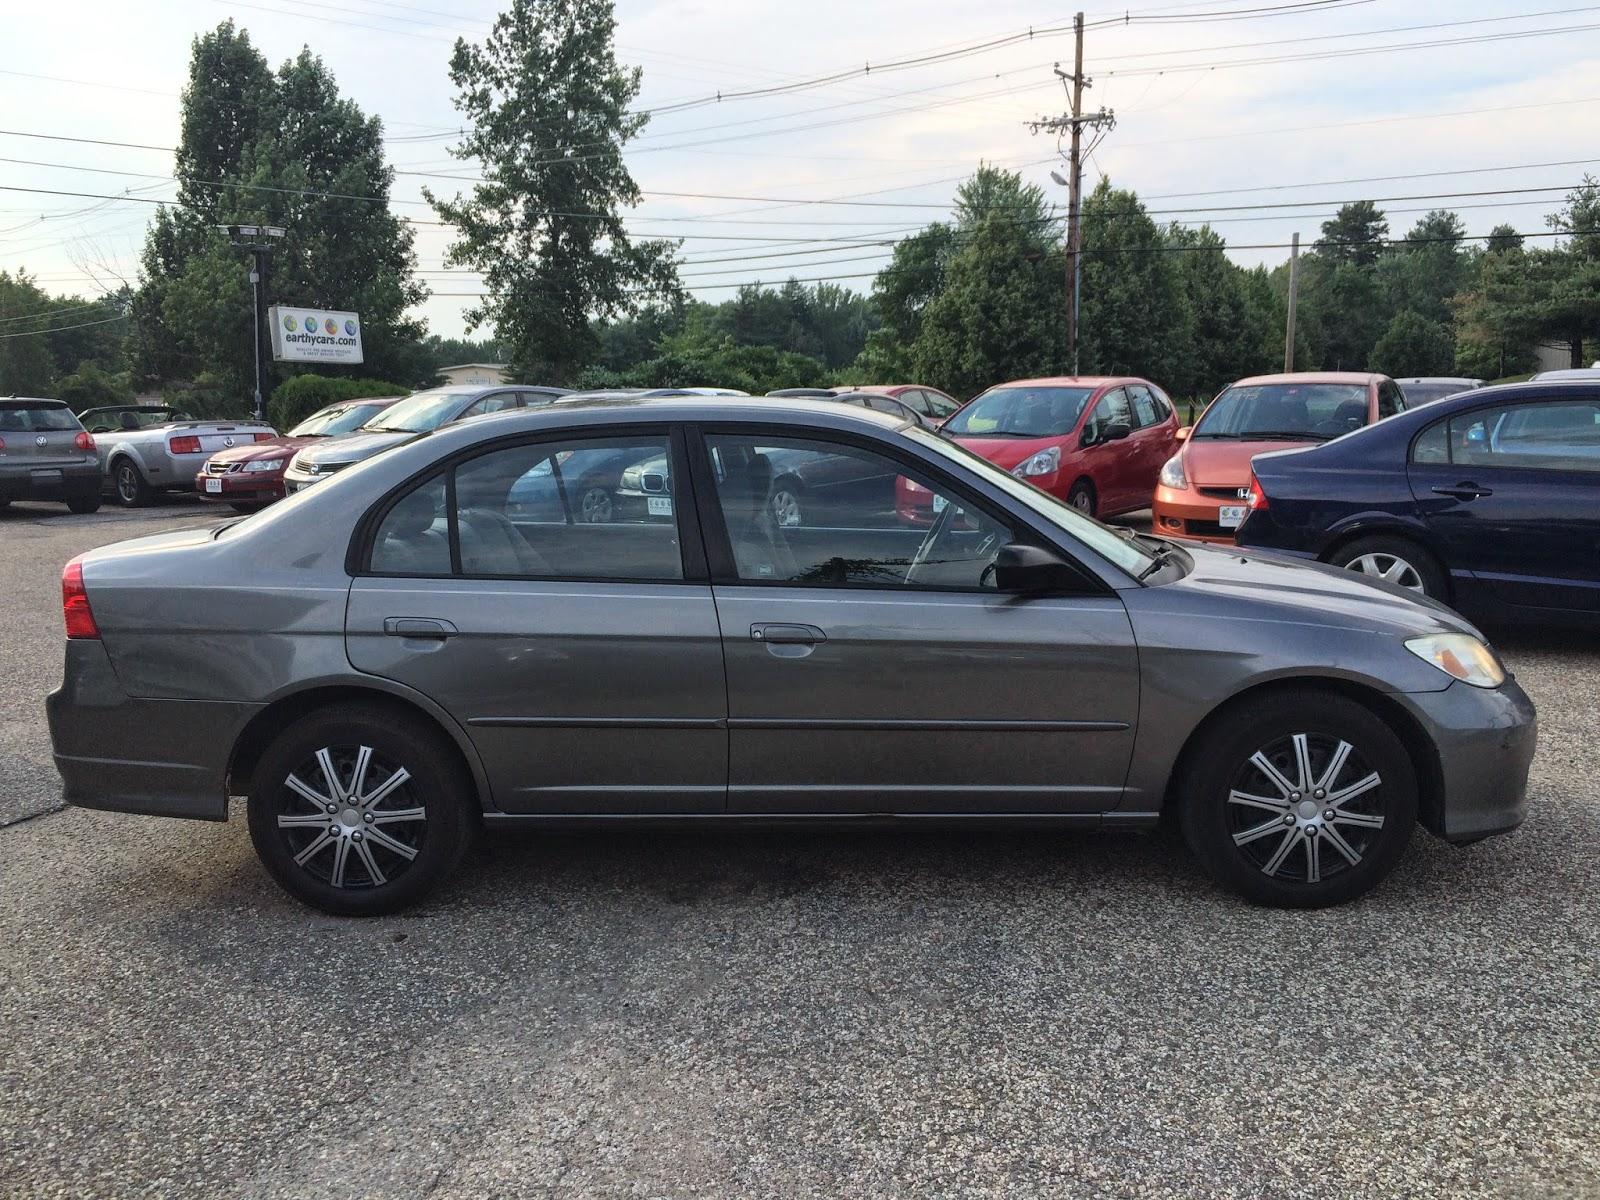 2004 Honda Civic LX Sedan, Grey, 137740 Mi, $5,995 Http://bit.ly/UX239p  Compact, 4 Spd Automatic, MPG U003d 25/34